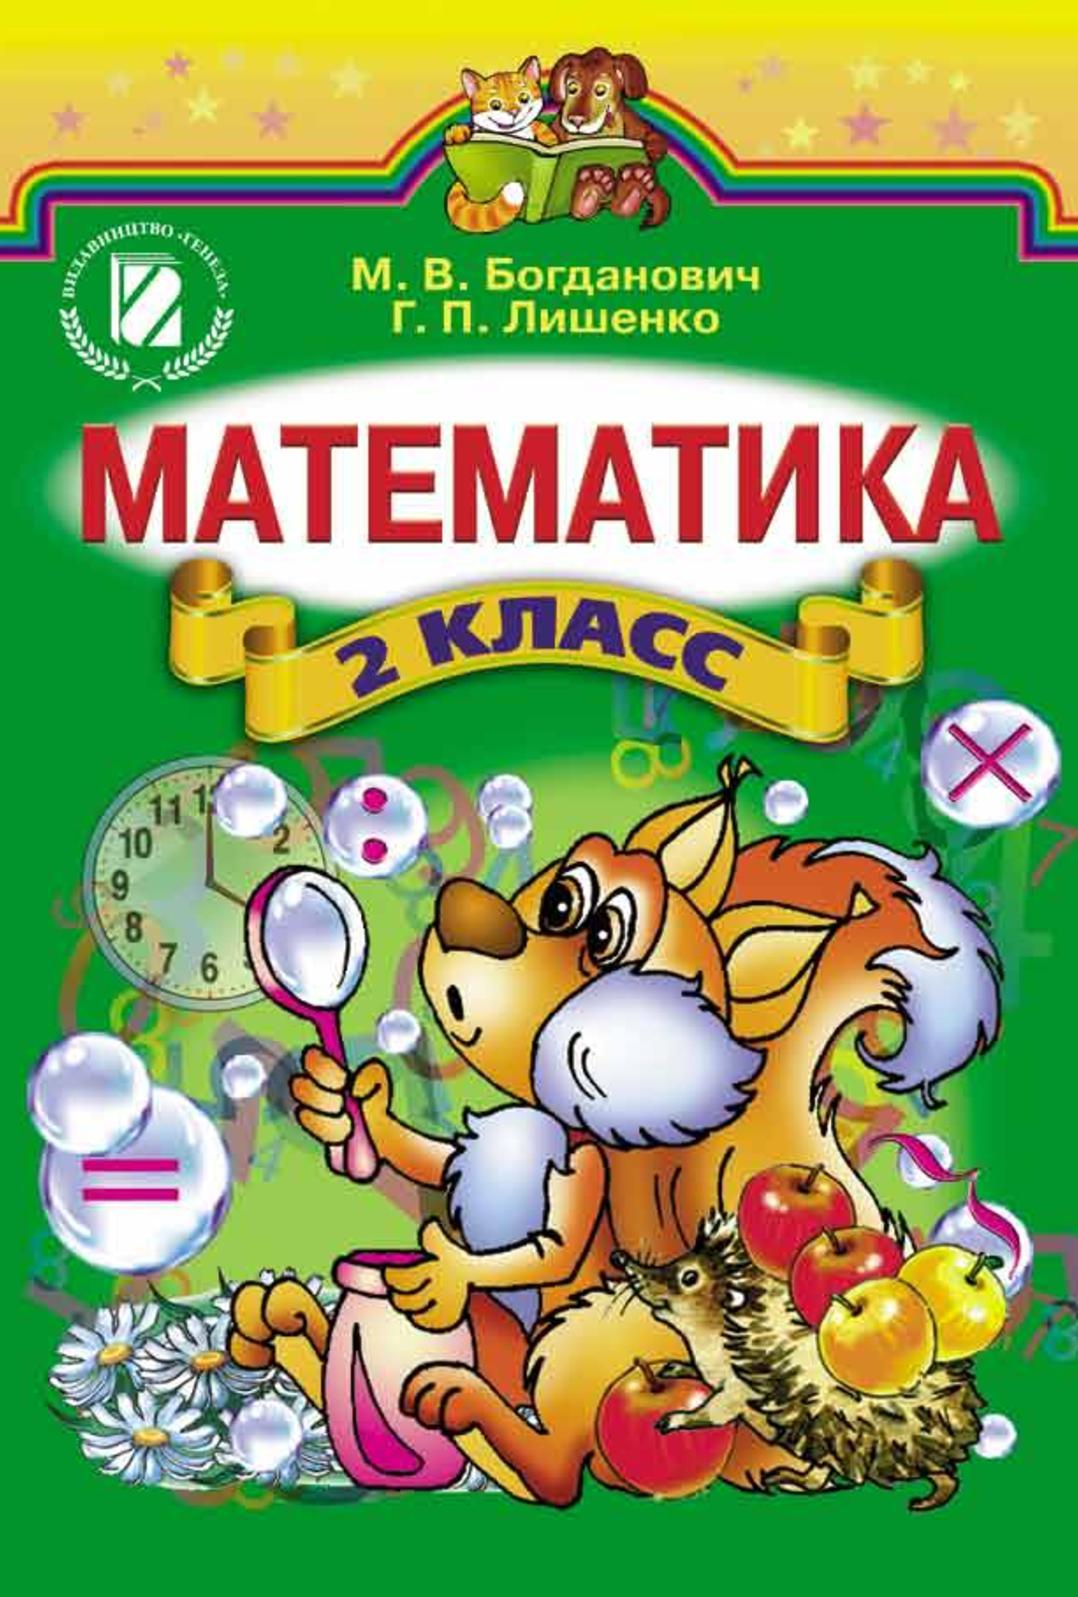 Решение задач во 2 классе богданович решение задач на логику математика 1 класс